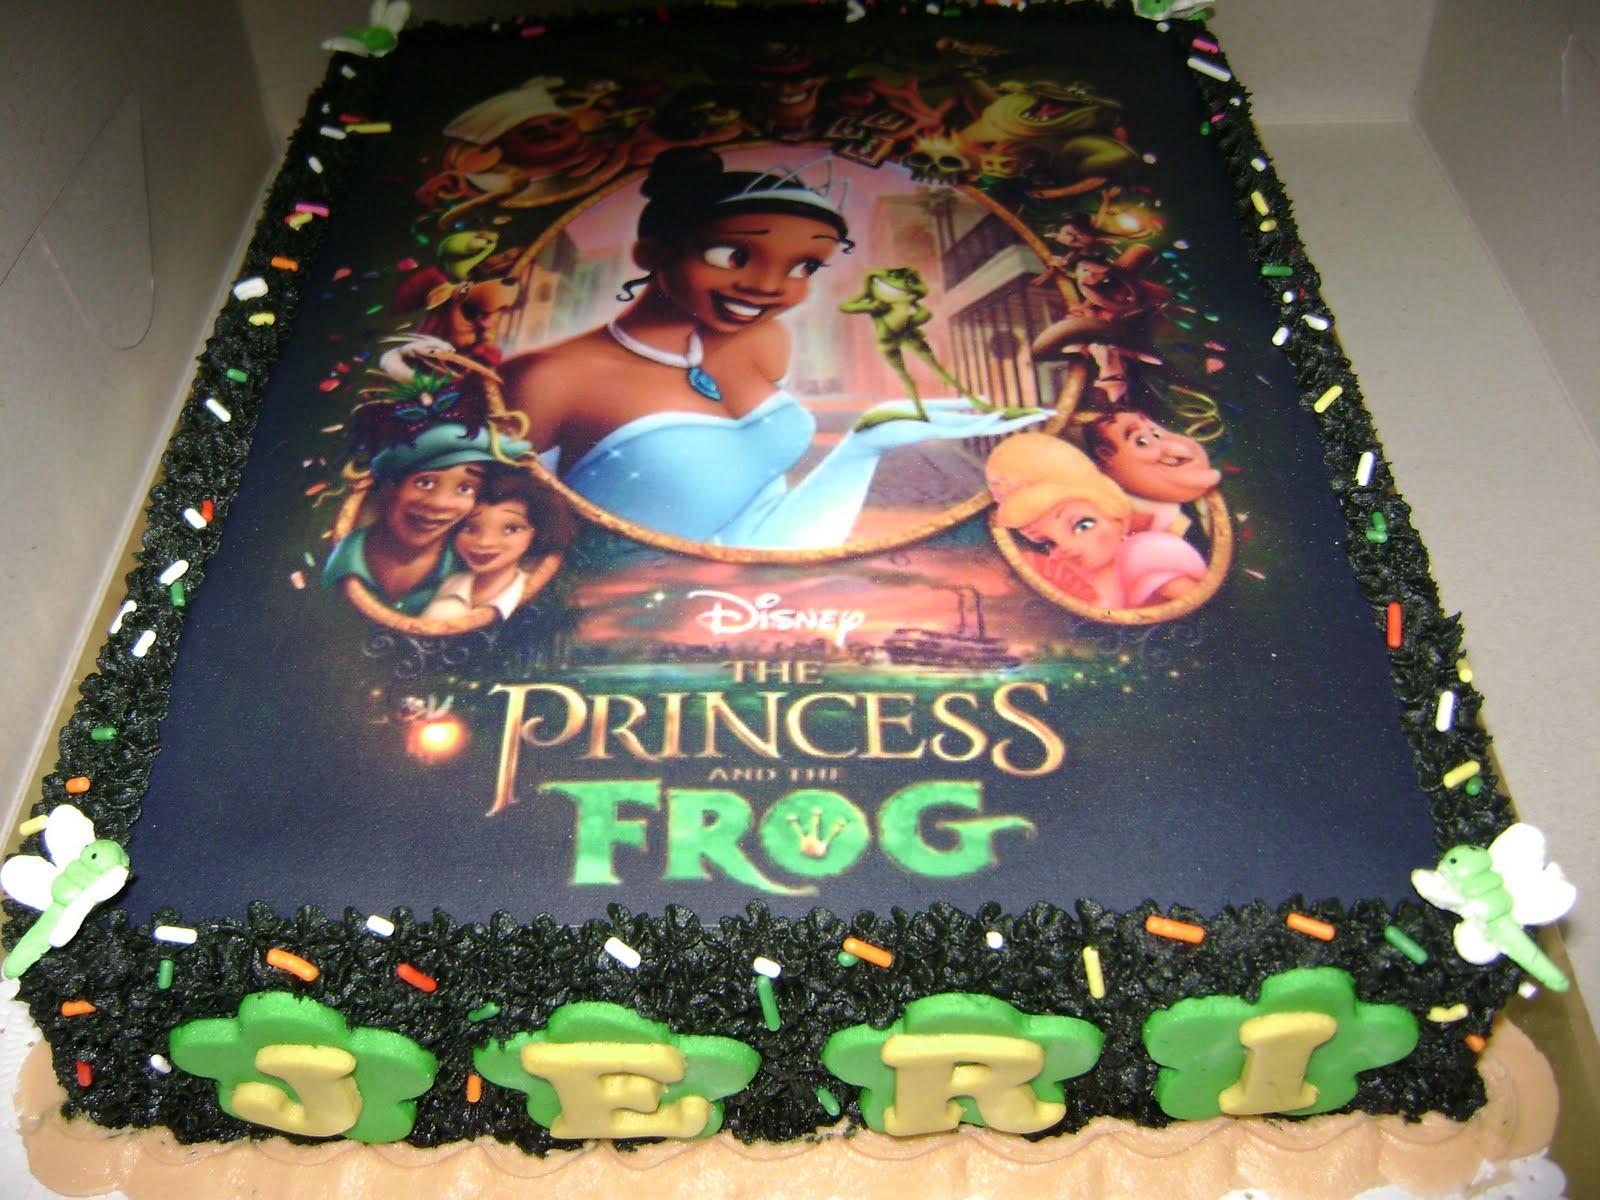 Superb Novelty Cakes 3d Cakes Amp Designer Cakes 4